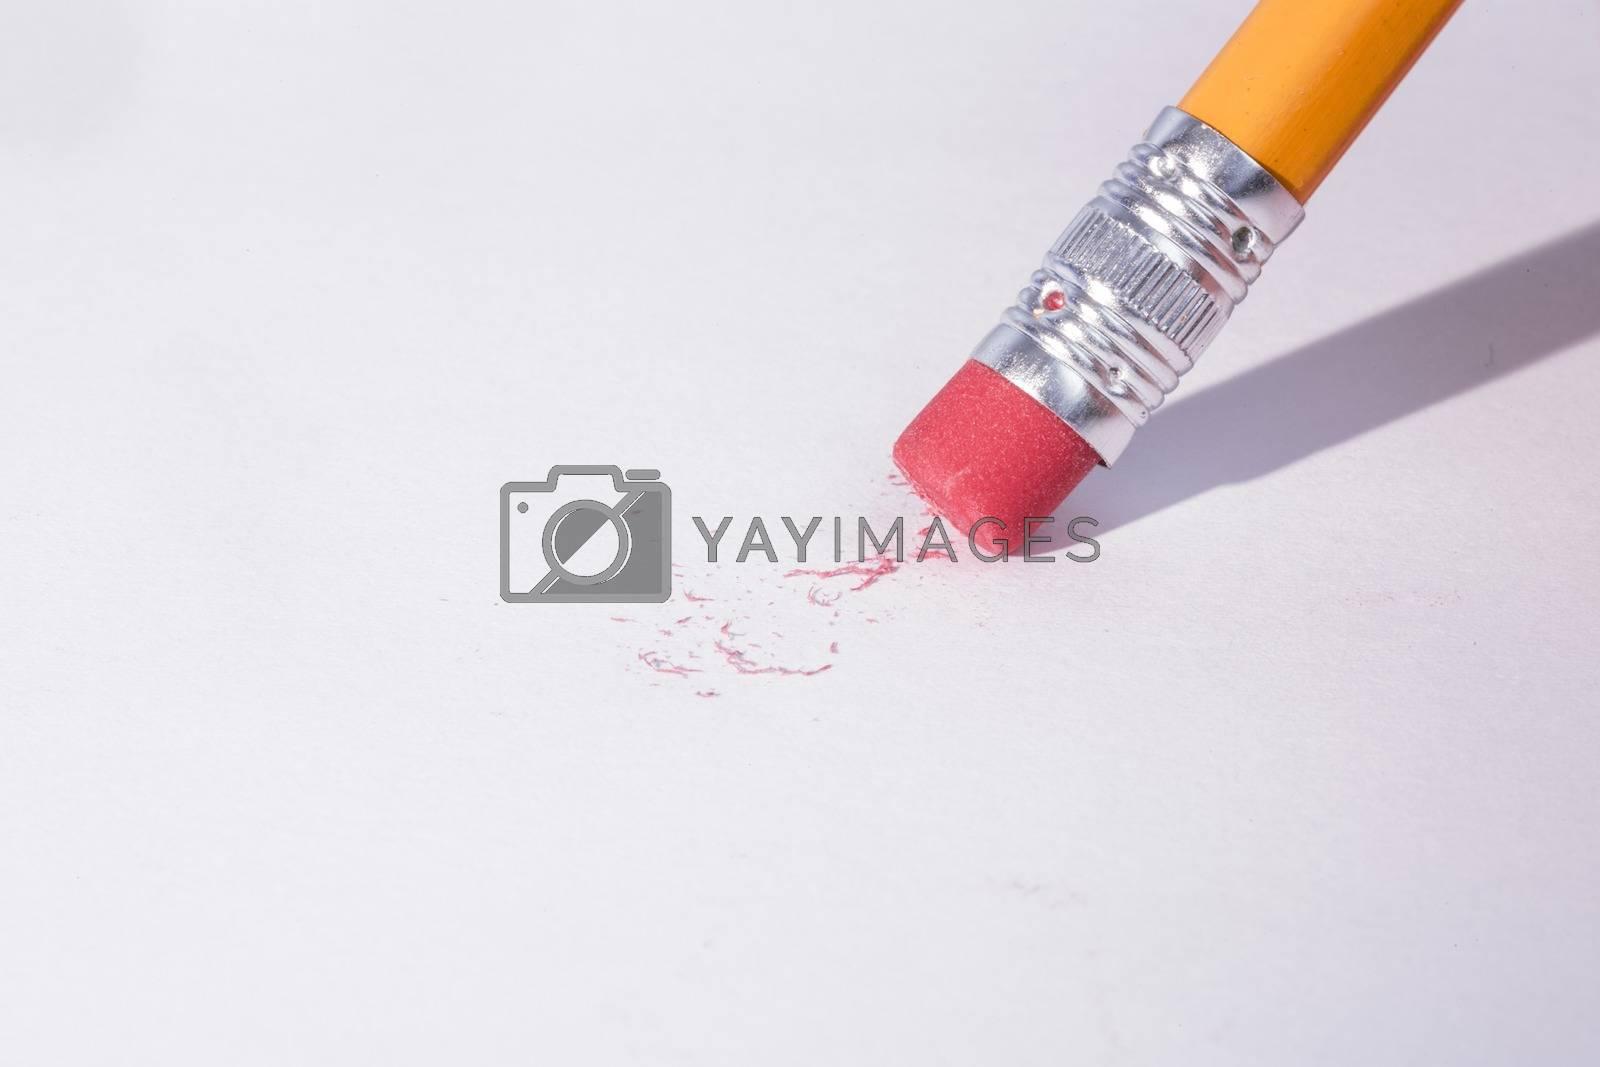 Royalty free image of Pencil erasing by Wavebreakmedia